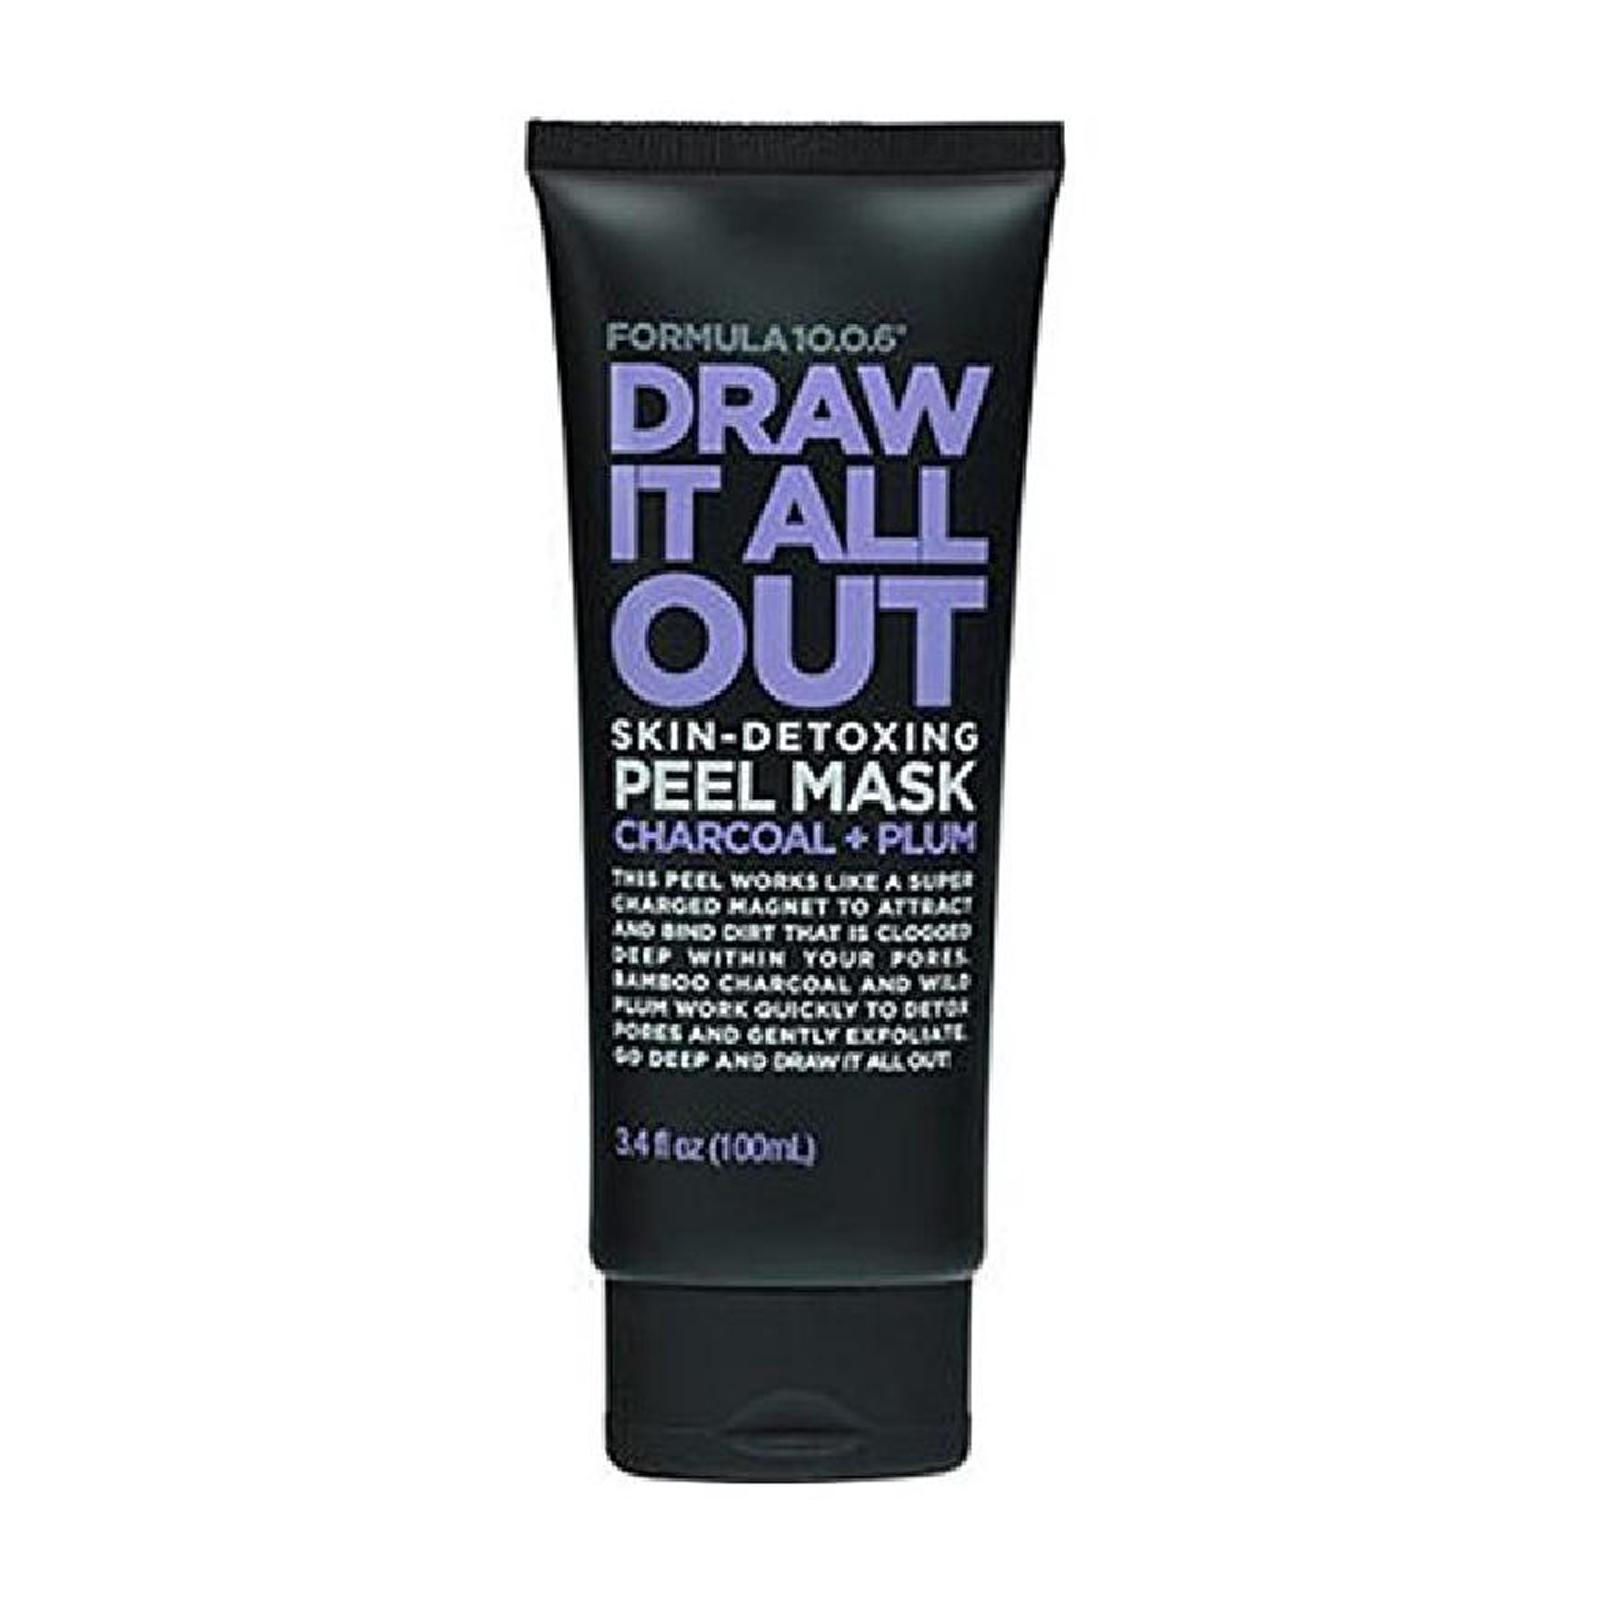 Formula 10.0.6 Draw It All Out Skin-detoxing Peel Mask